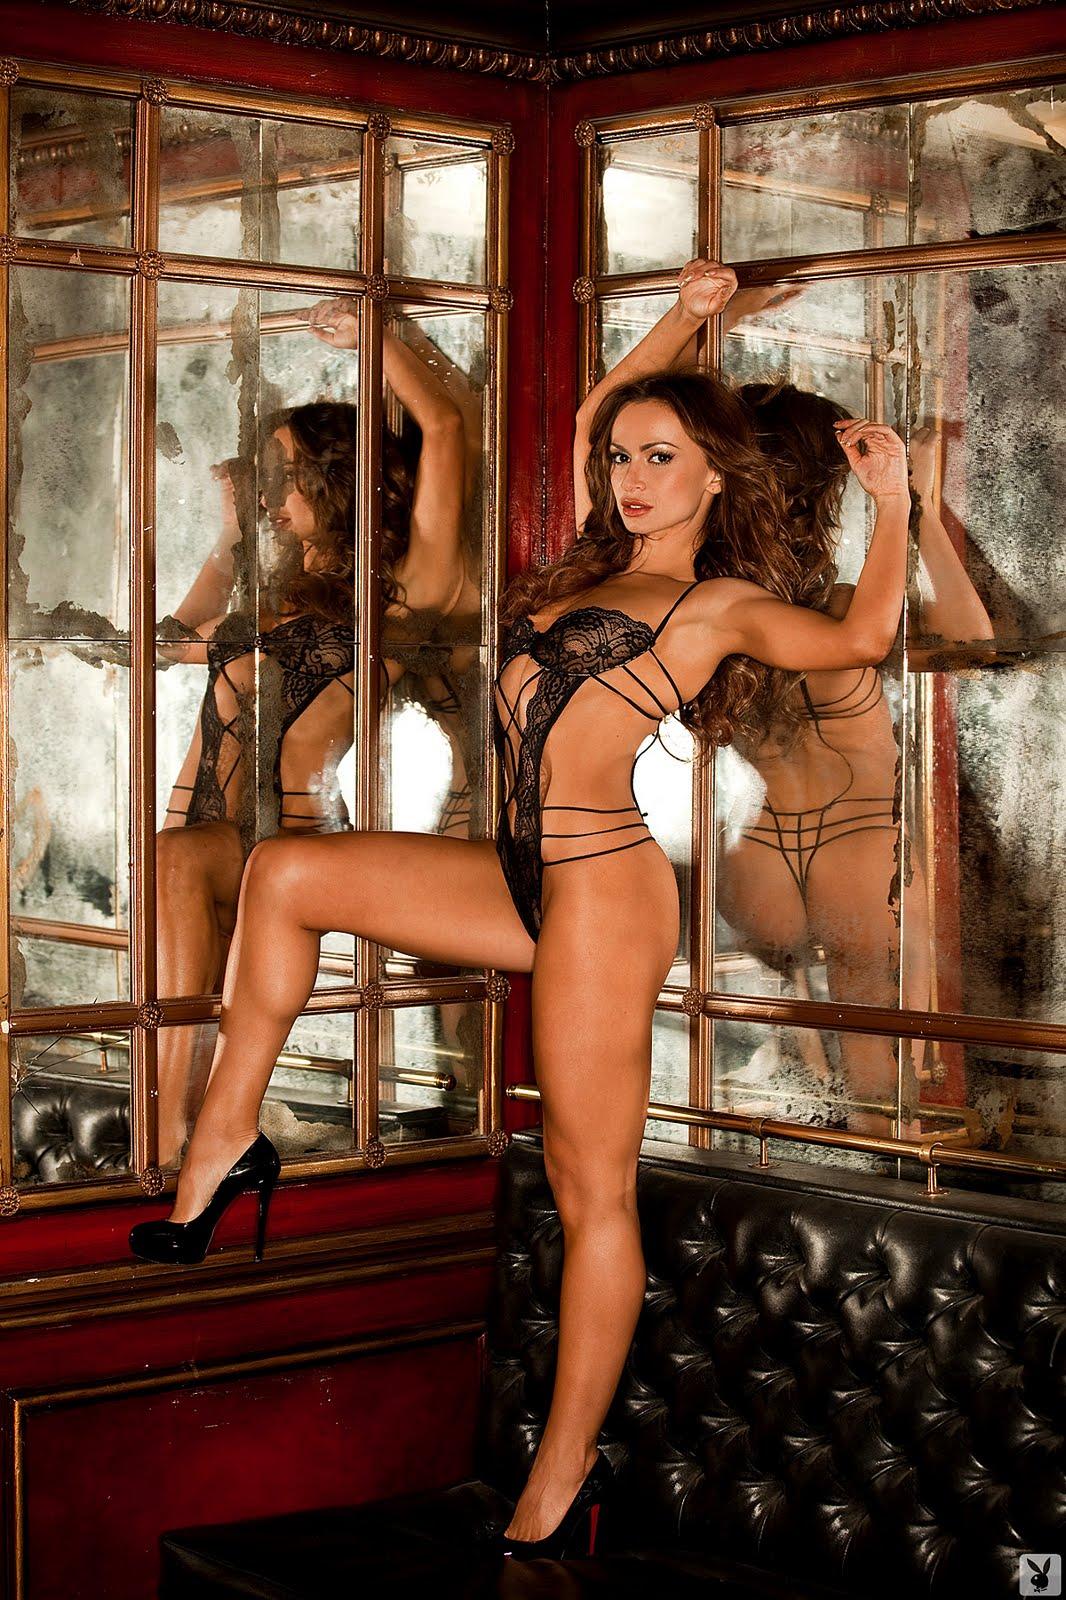 Karina smirnoff naked pics